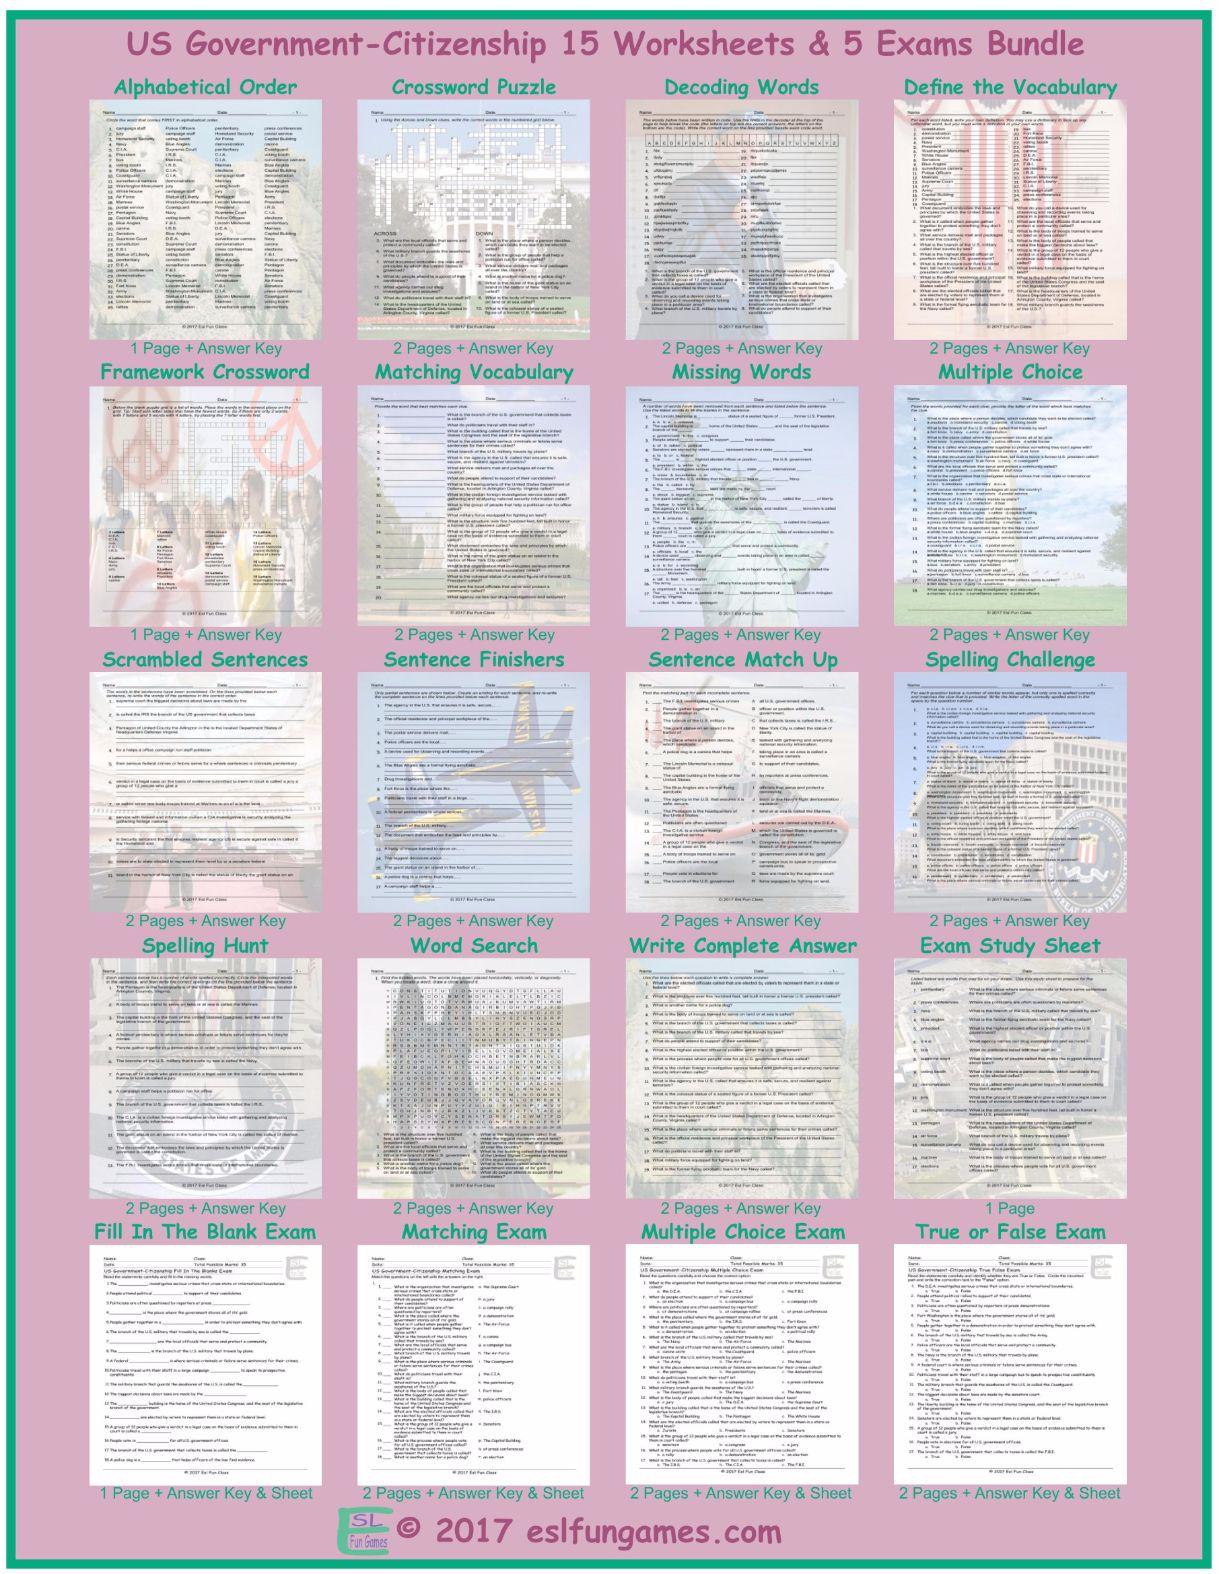 Us Government Citizenship 20 Worksheet Exam Bundle